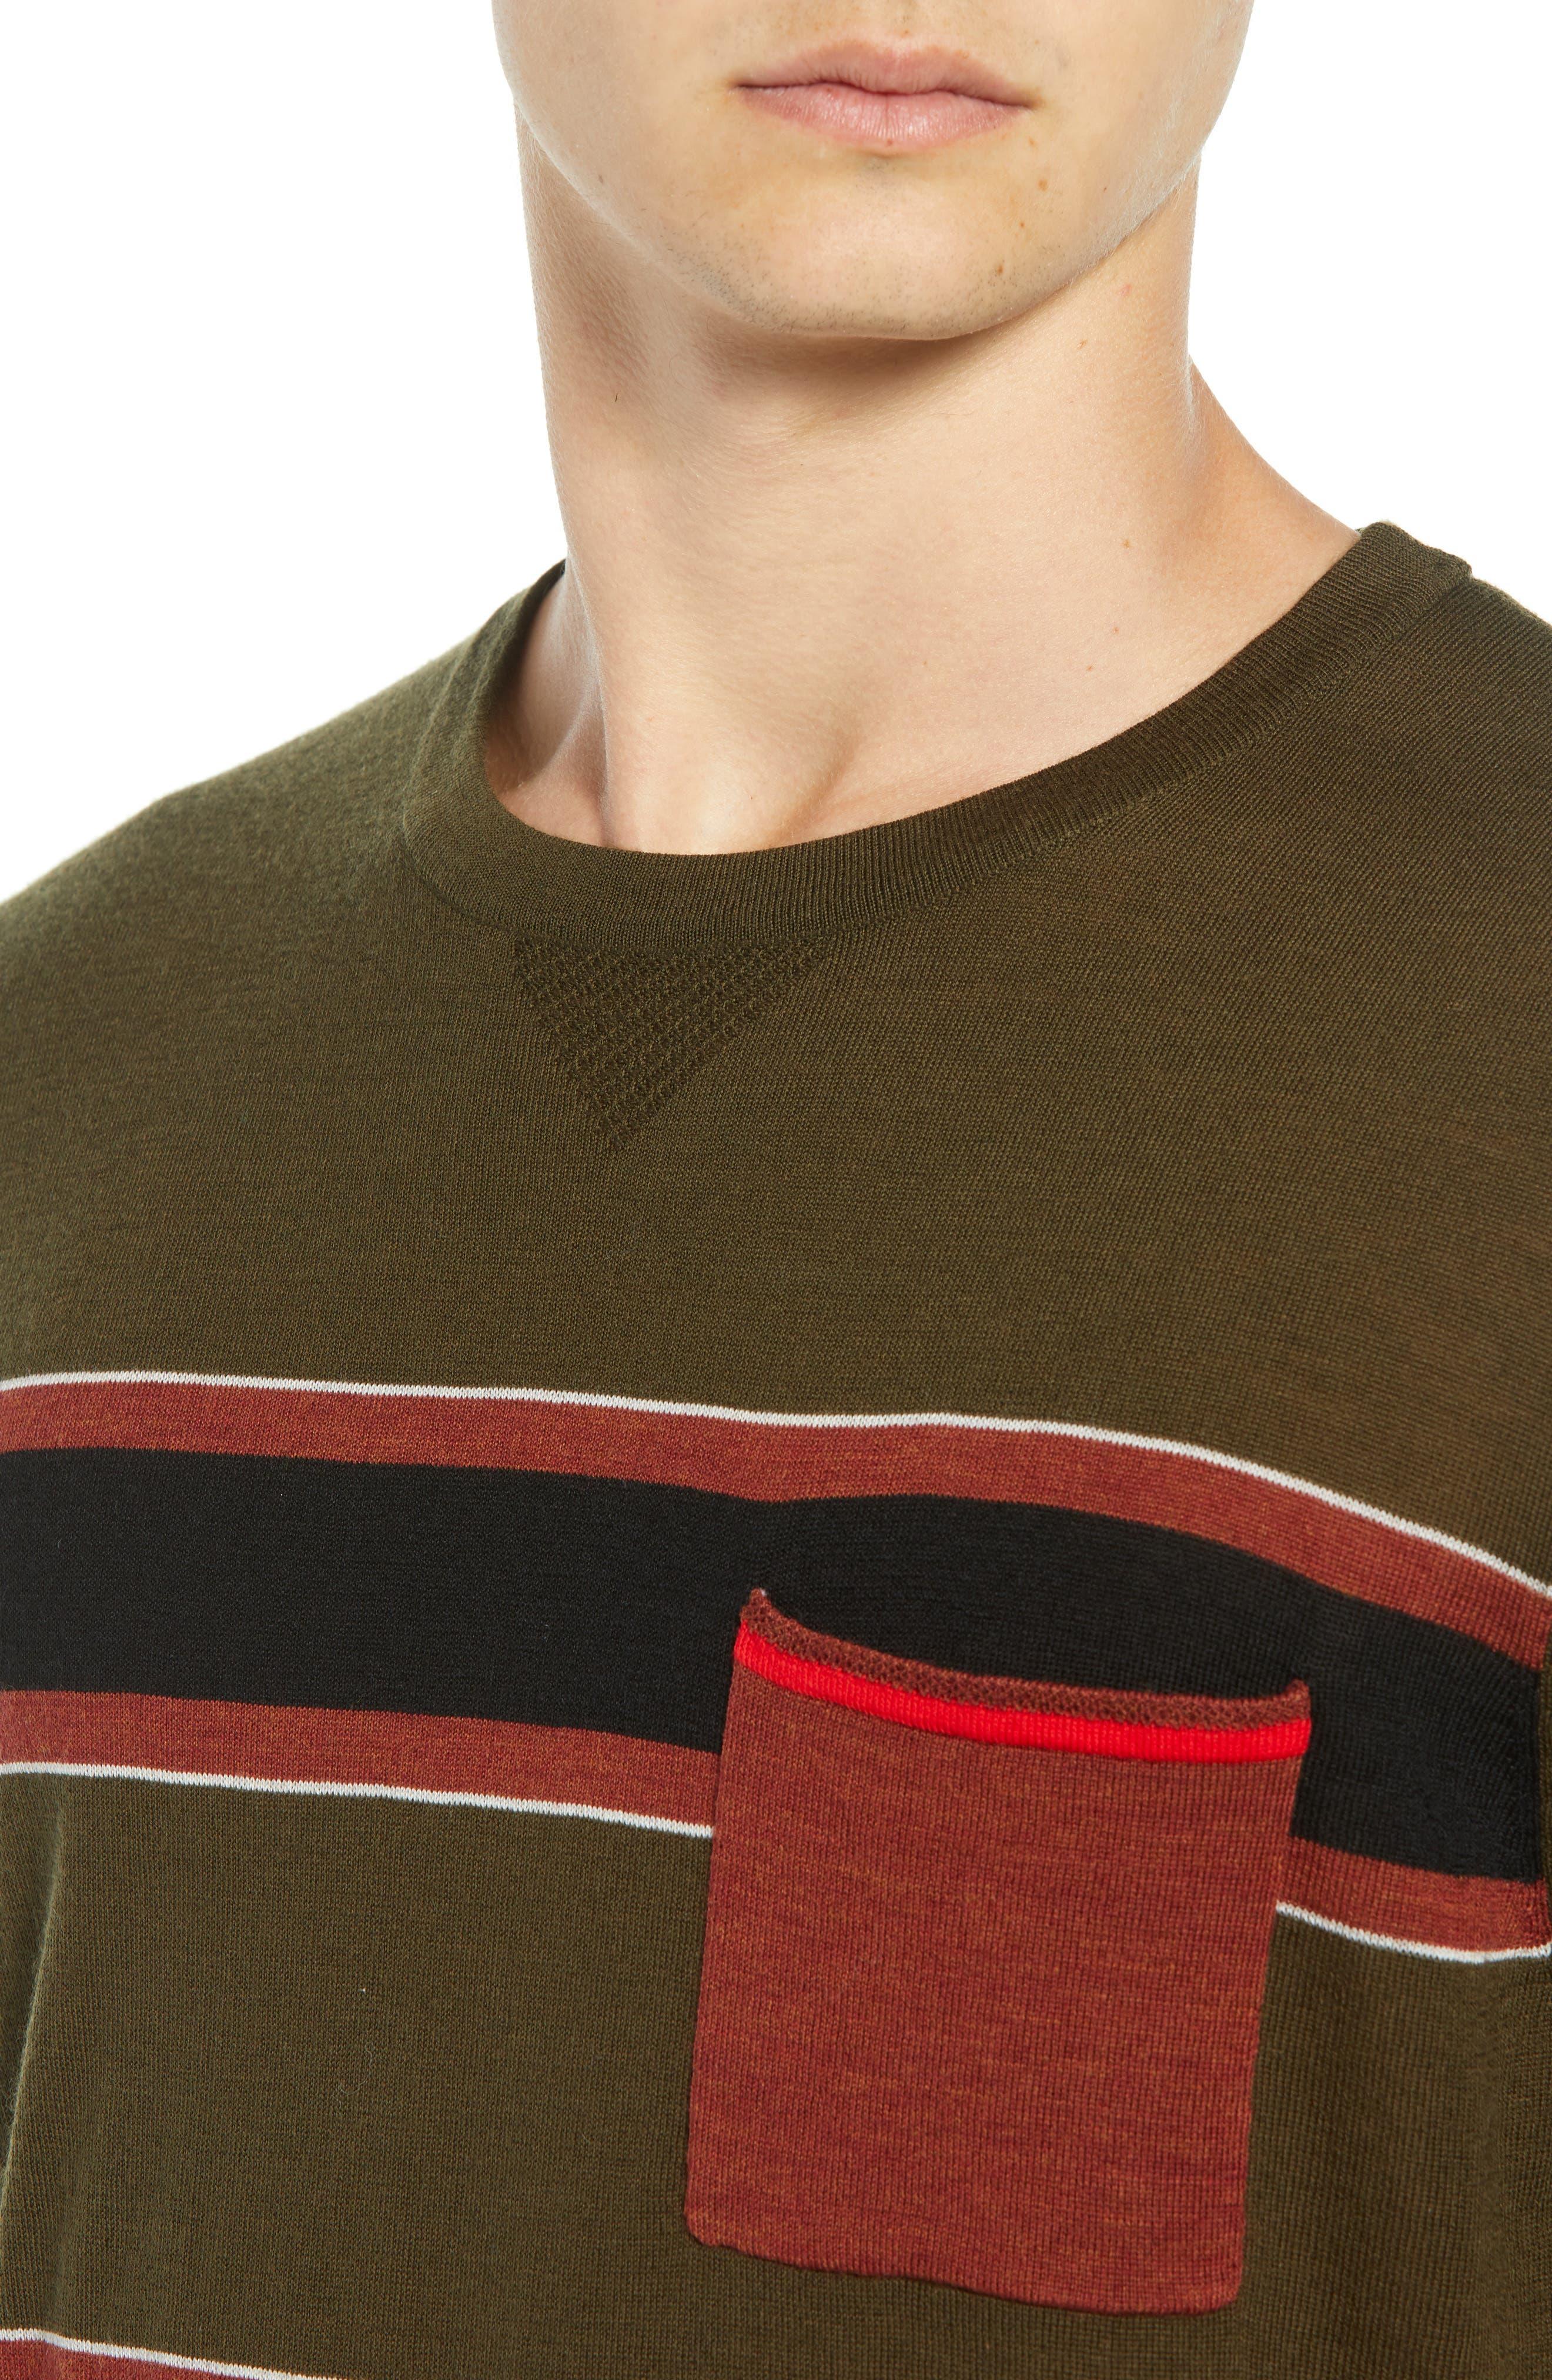 Stripe Merino Wool Pocket T-Shirt,                             Alternate thumbnail 4, color,                             COMBO B